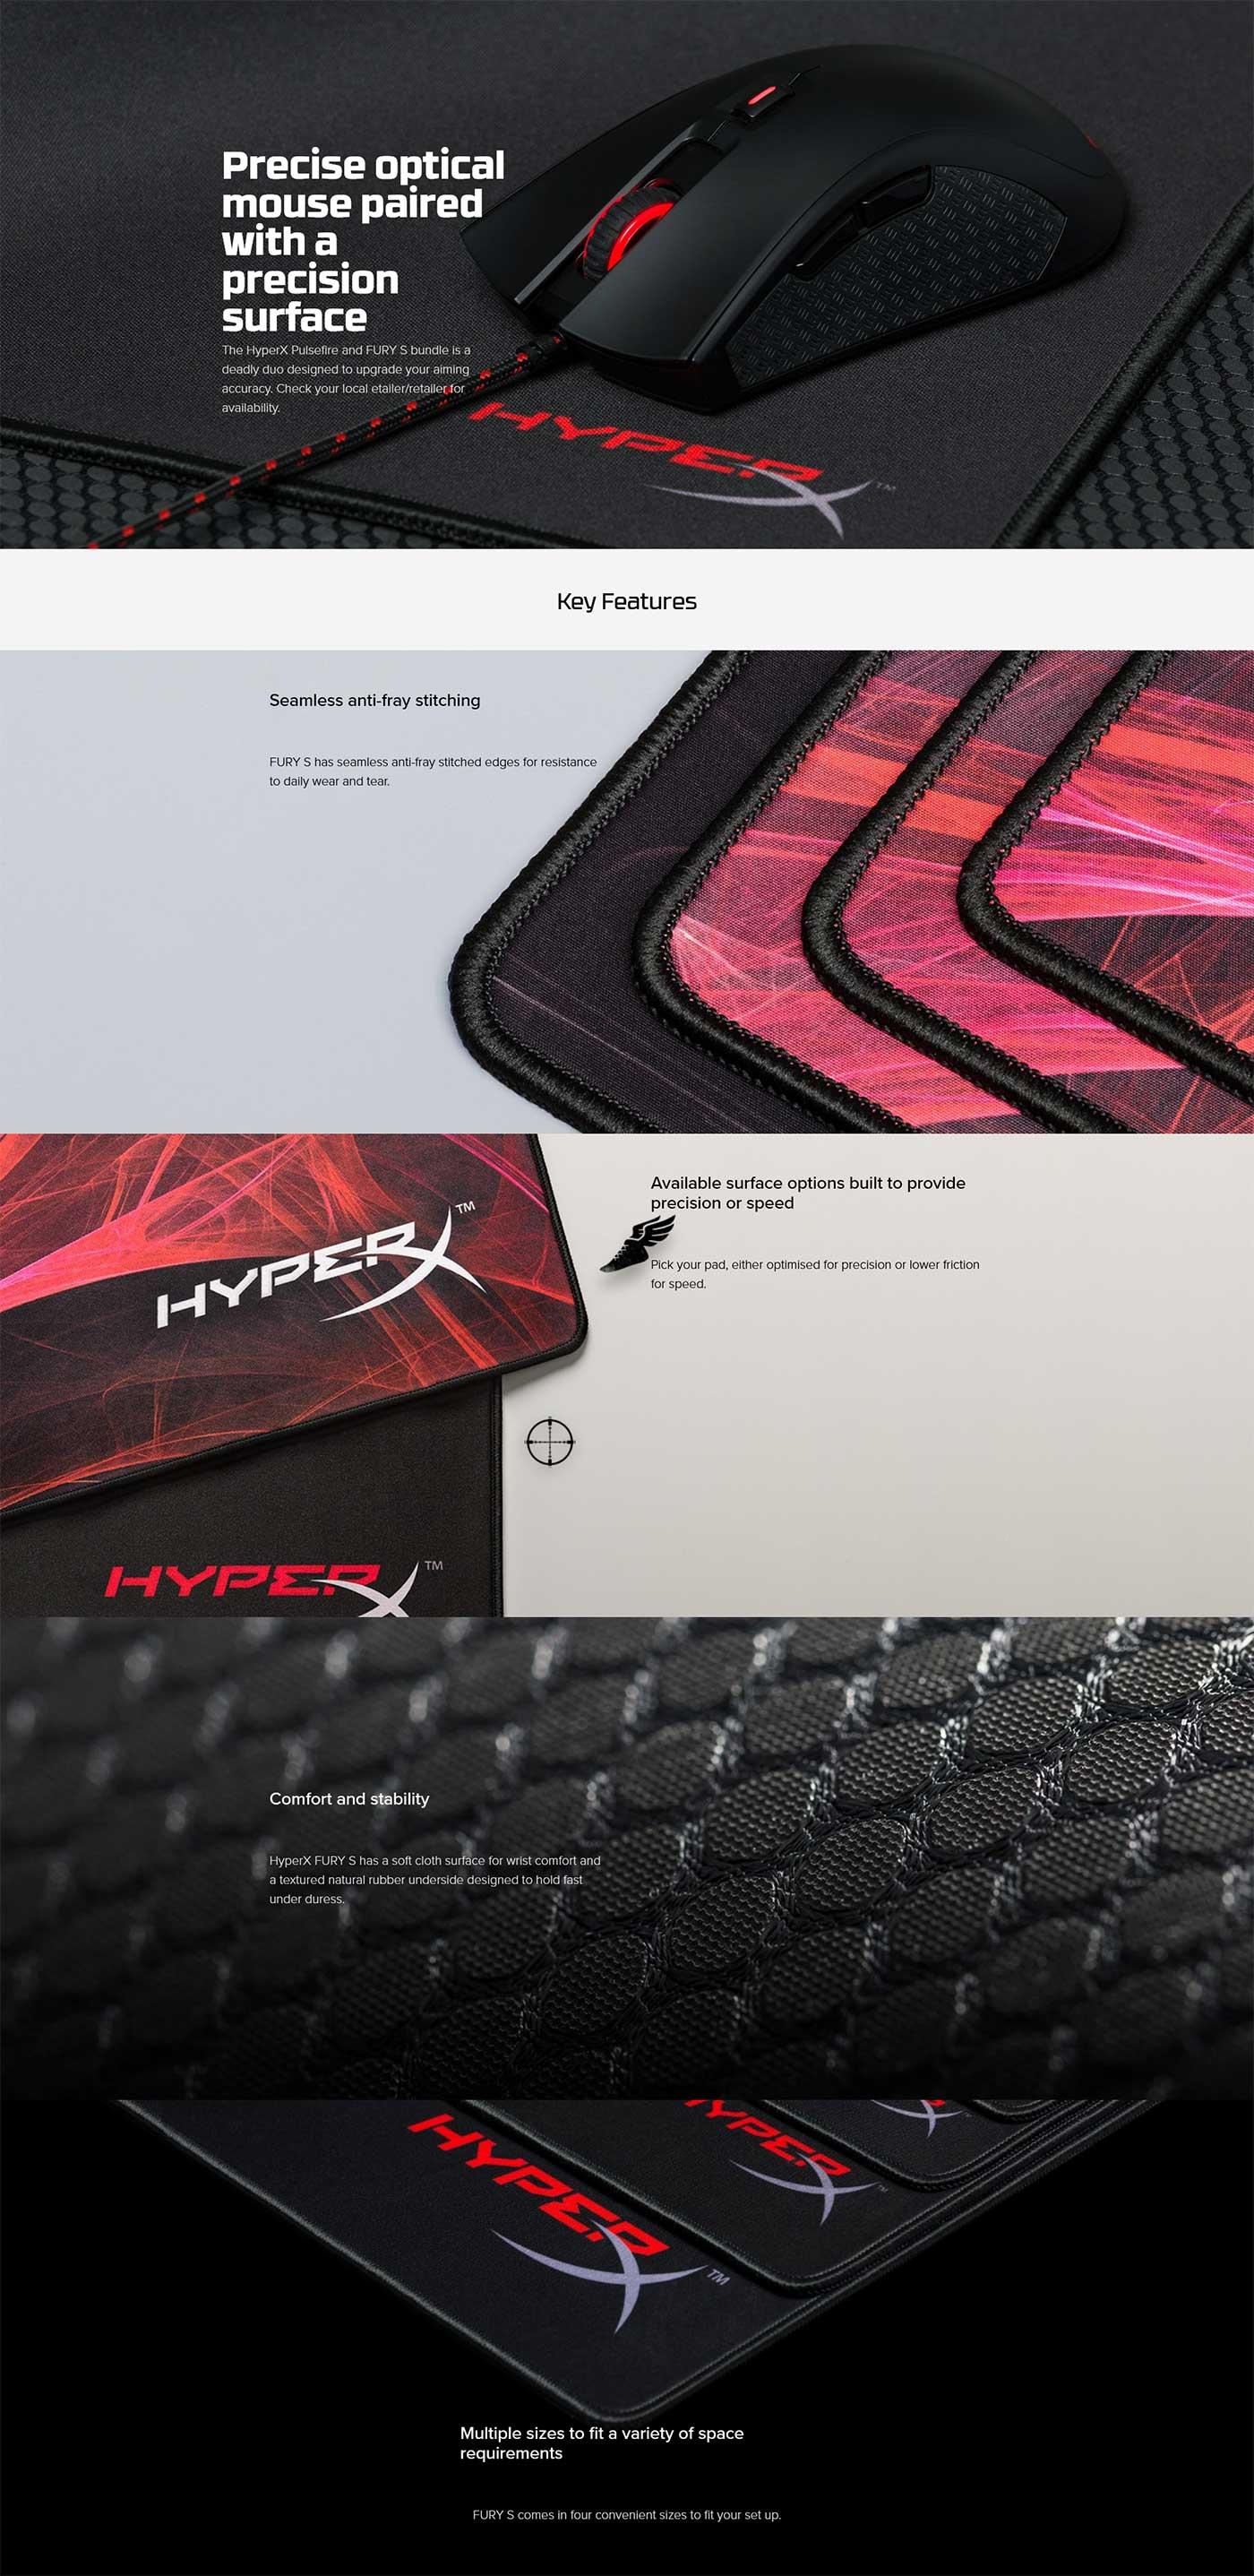 Kingston HyperX Fury S Mouse Pad HX-MPFS-M - Medium Features